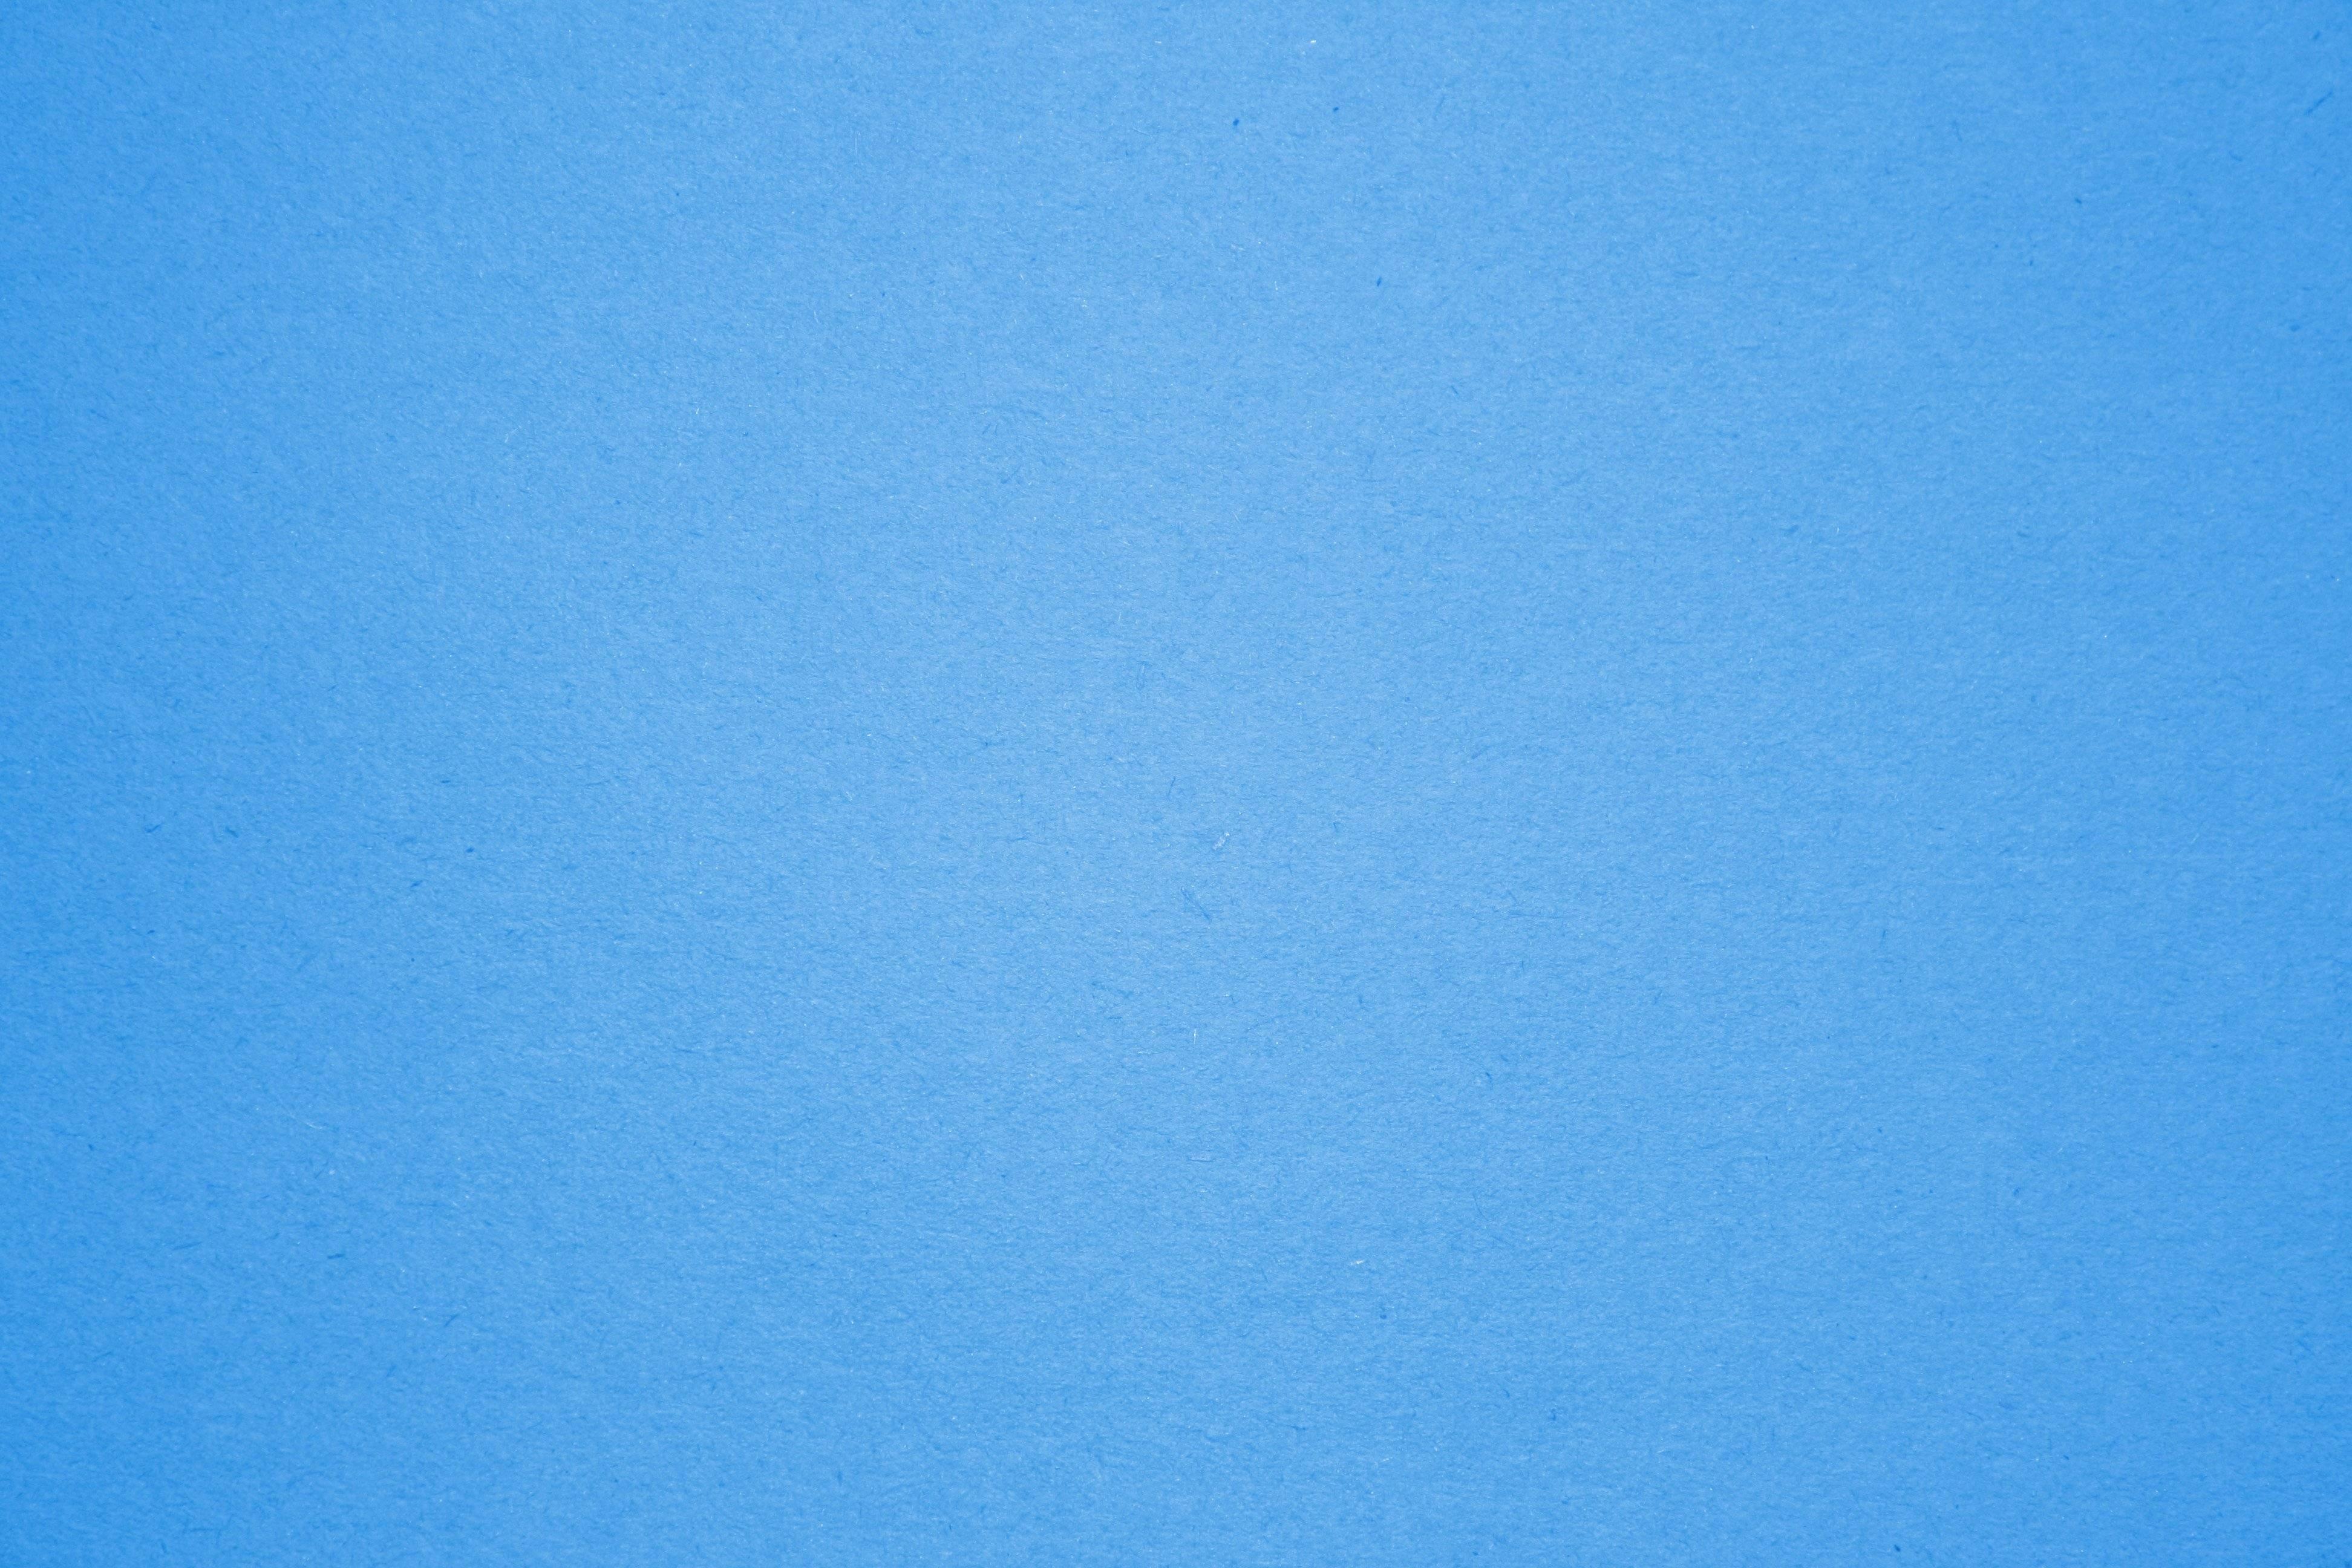 Light Blue Backgrounds 3888x2592